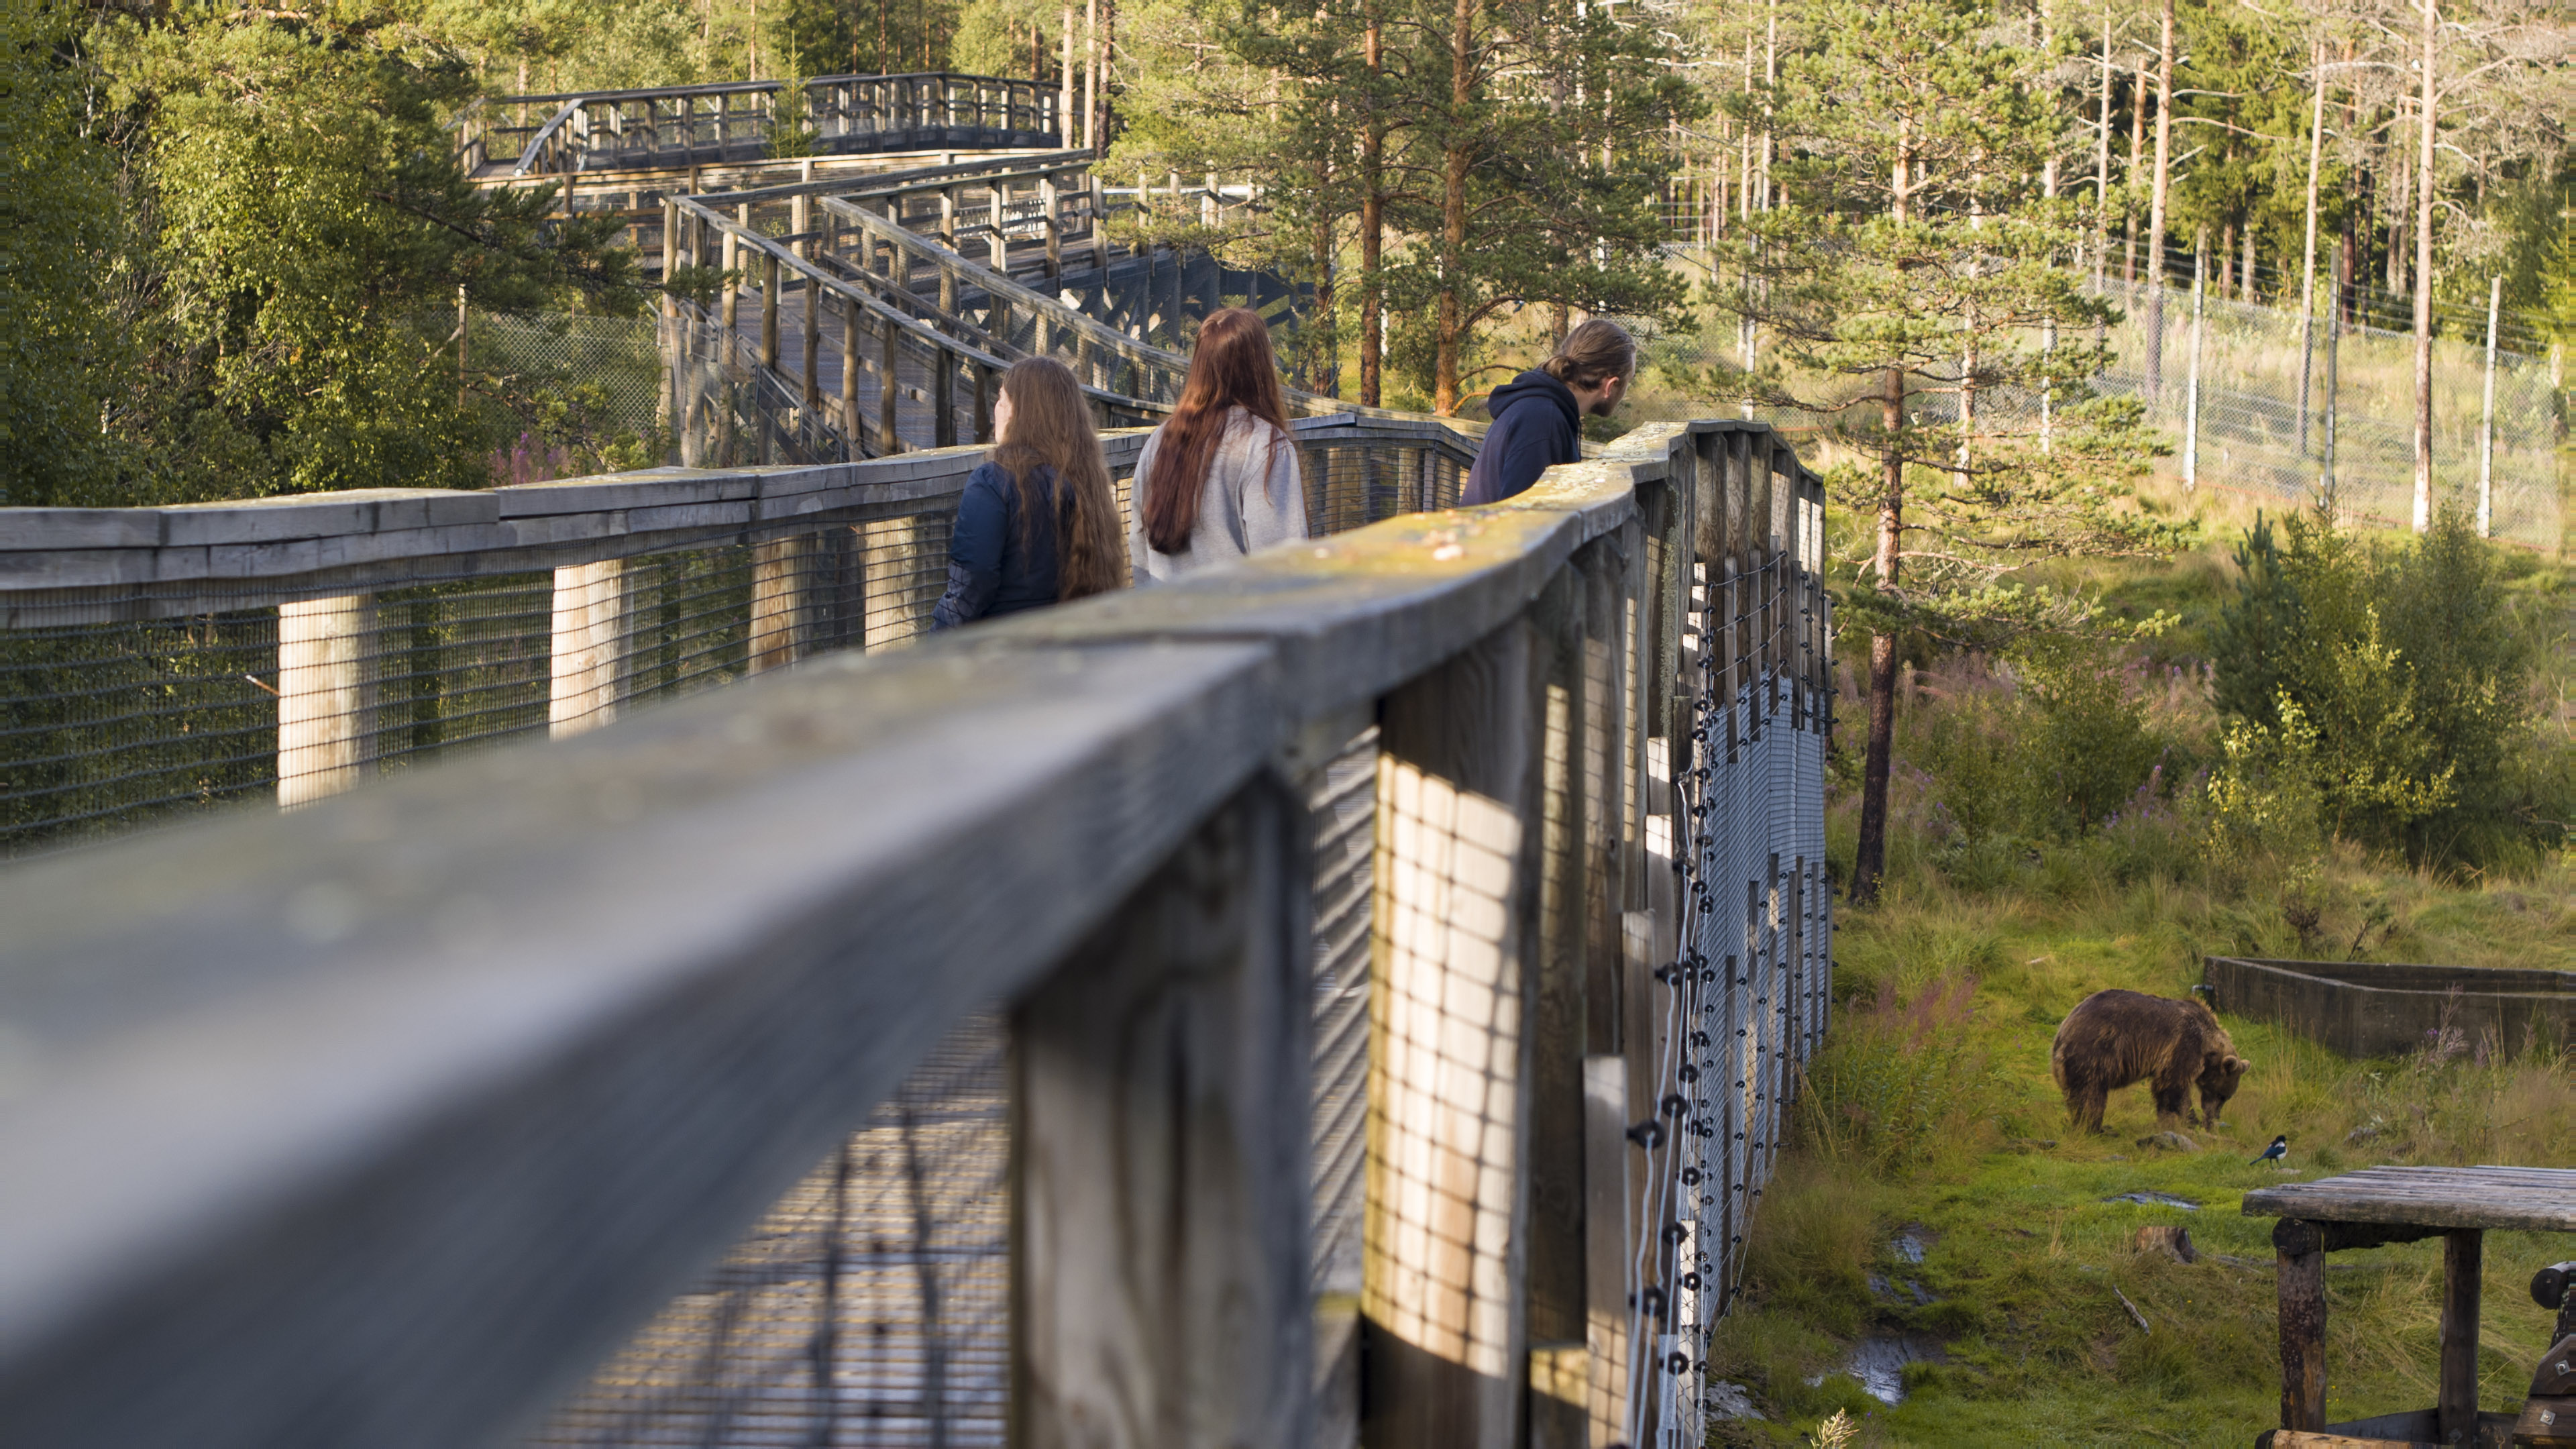 Namsskogan familiepark bjørn, ved E6 i Namdalen i Trøndelag. Foto: Grim Berge